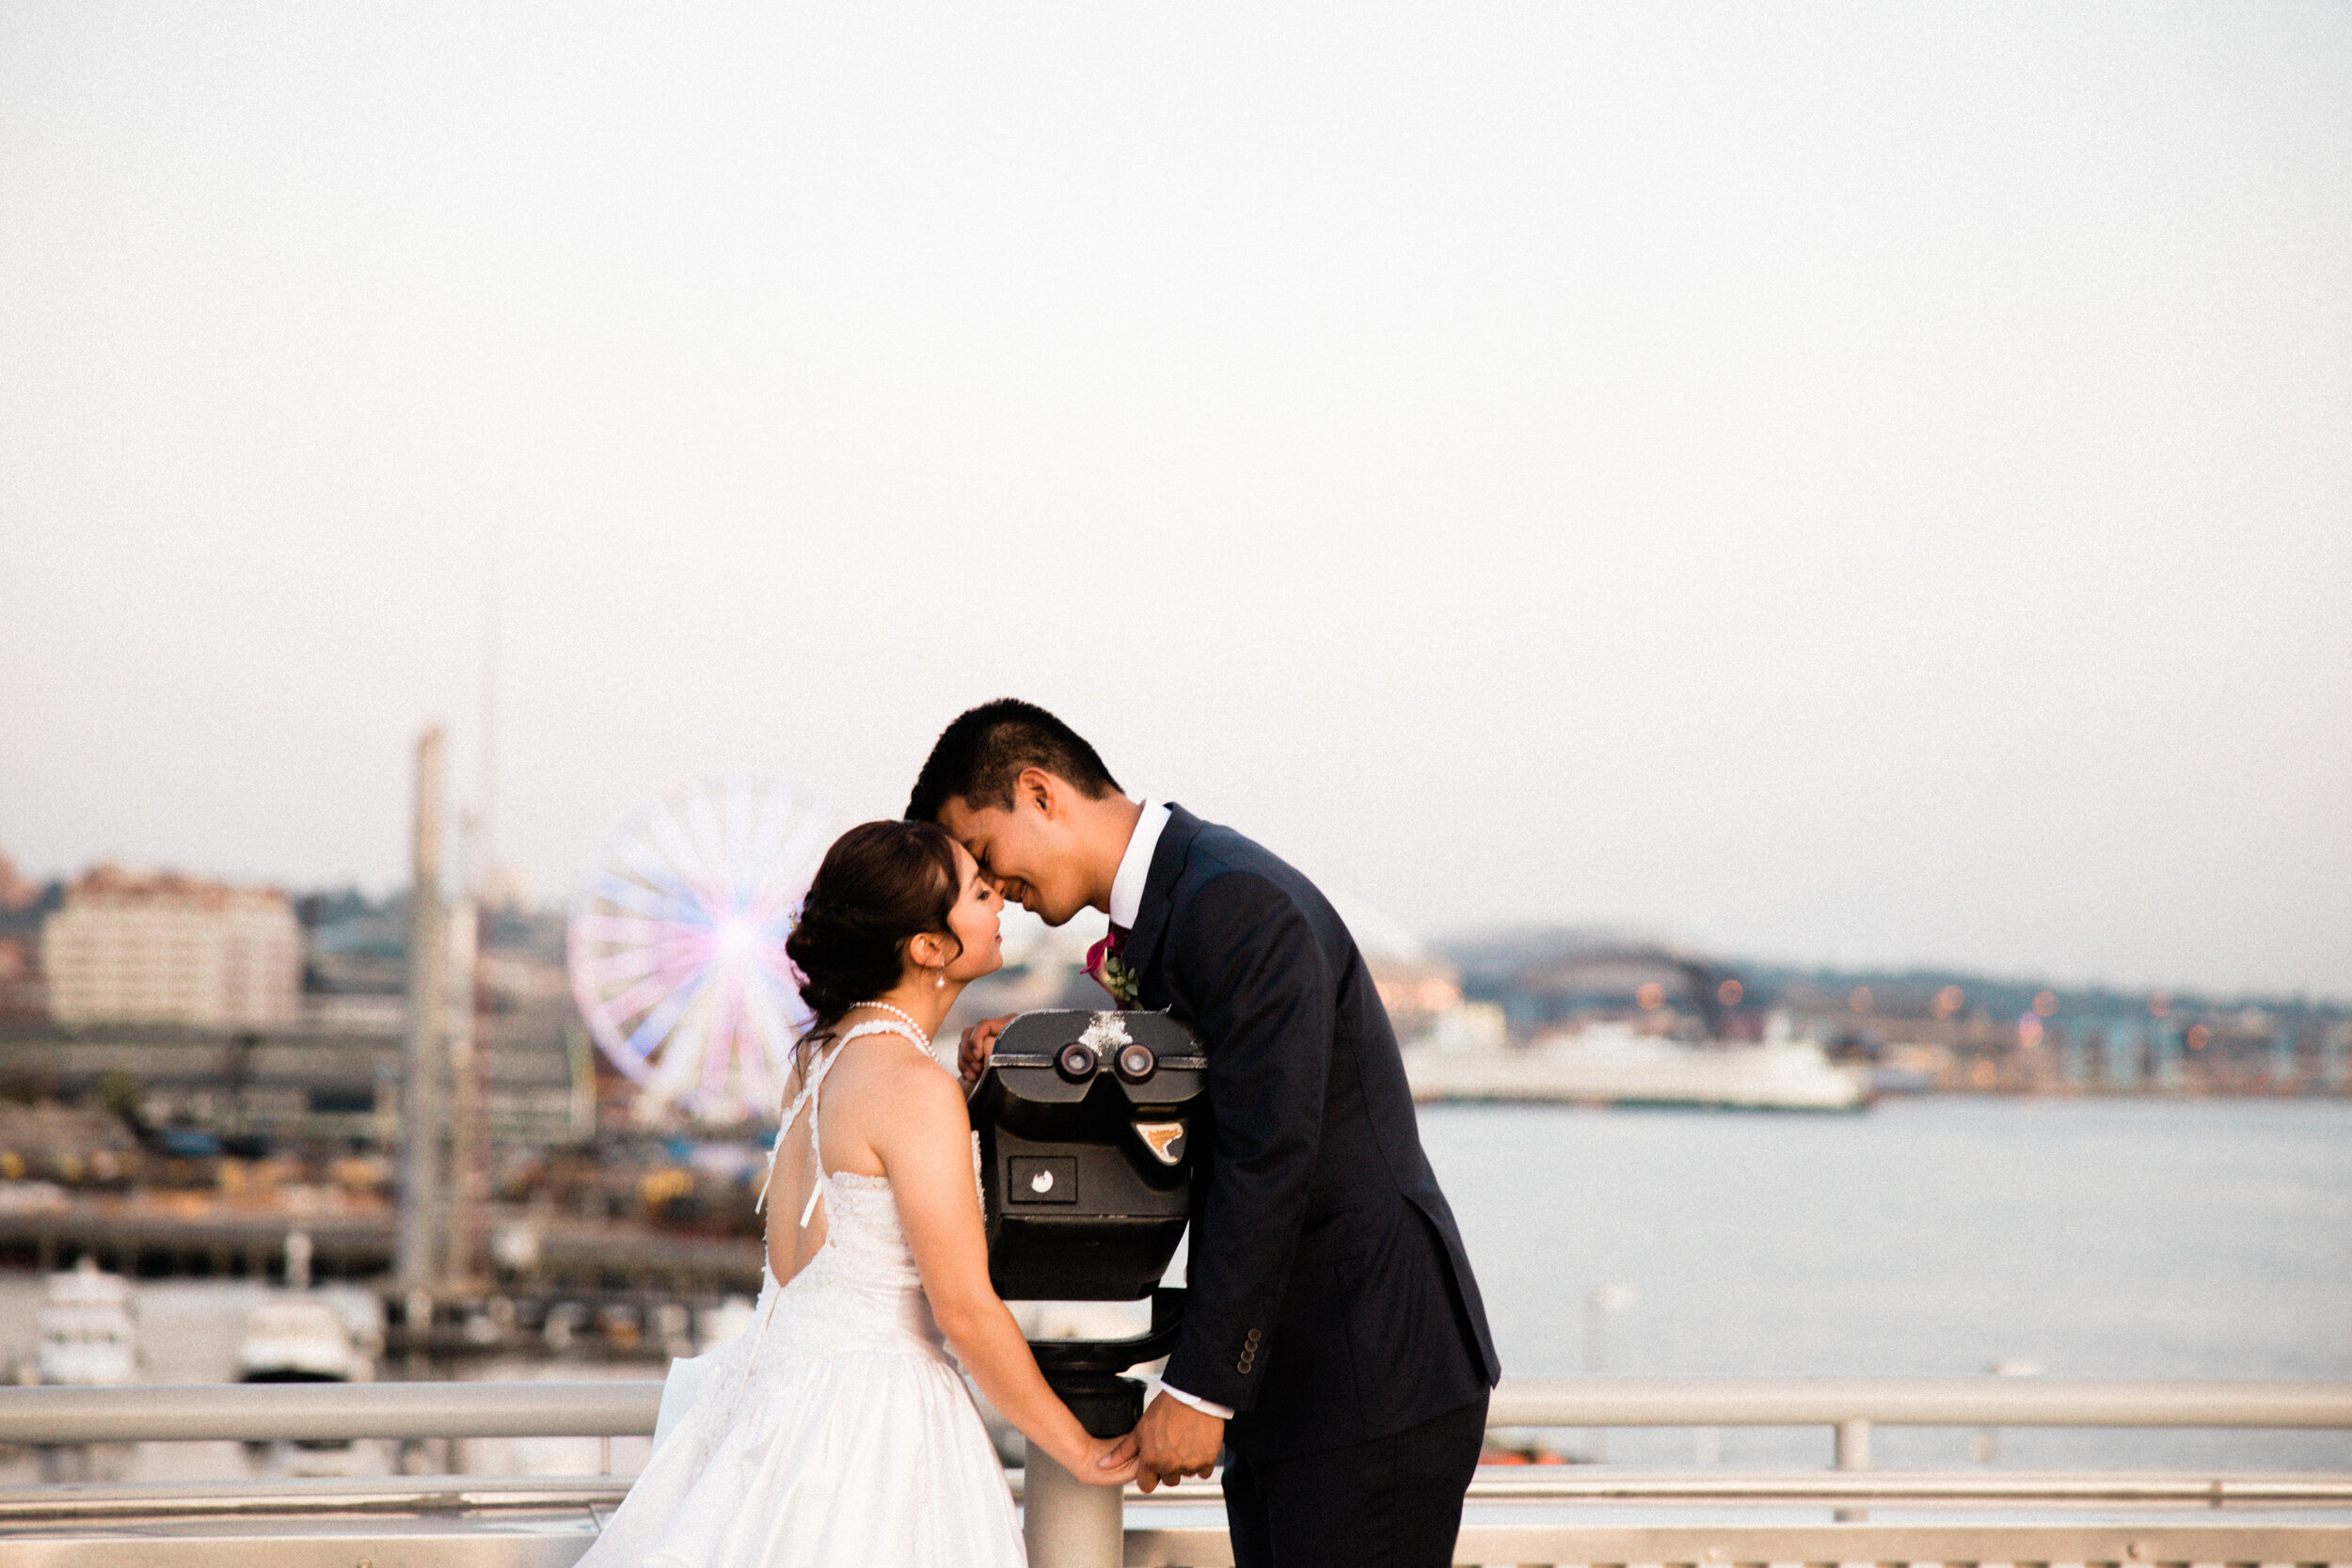 Cassie + Jowell - Wedding at the Edgewater Hotel